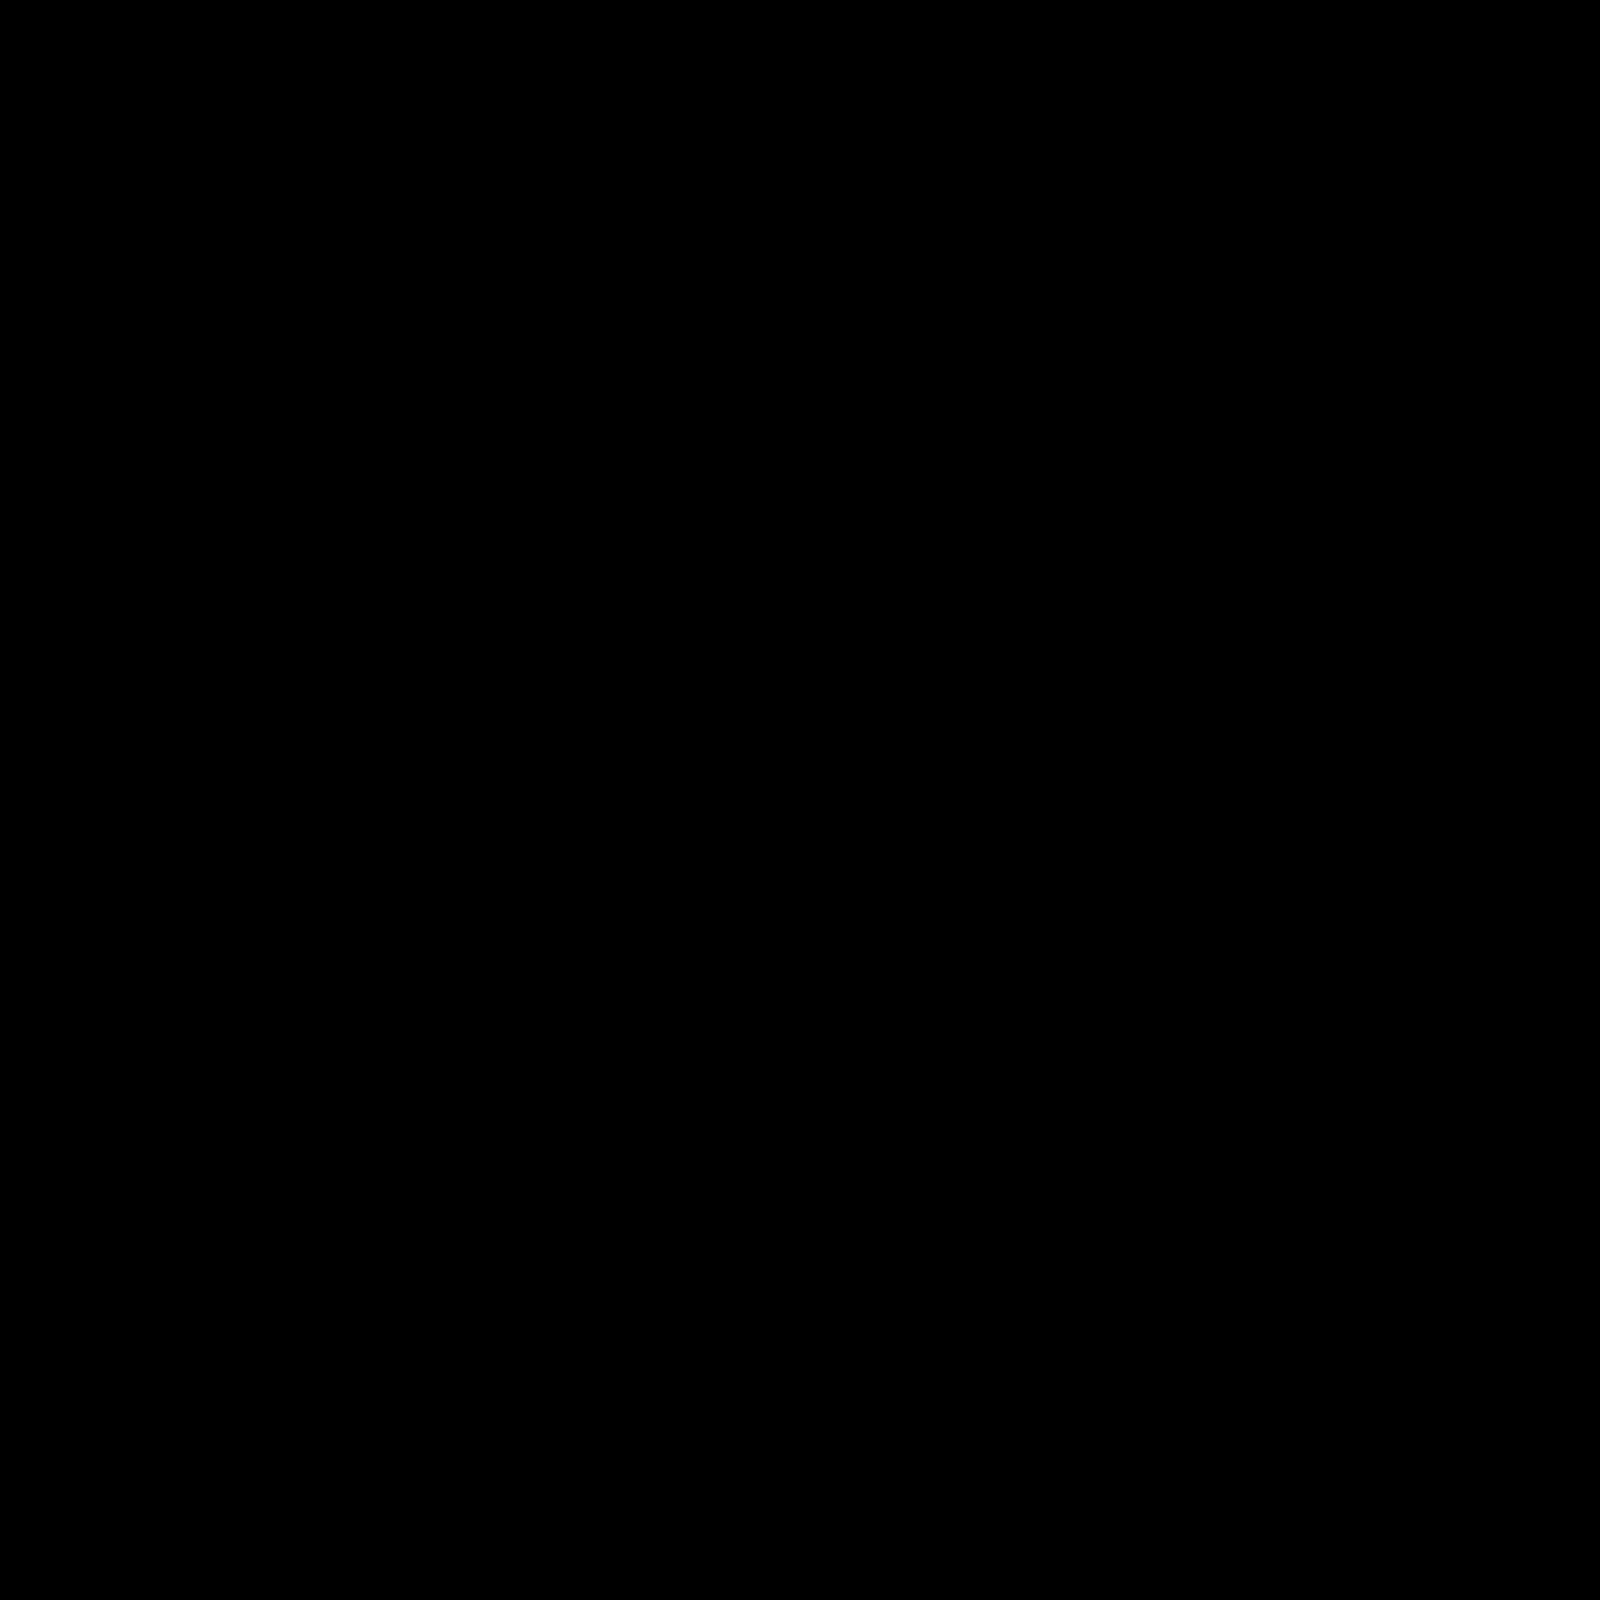 Panties Filled icon